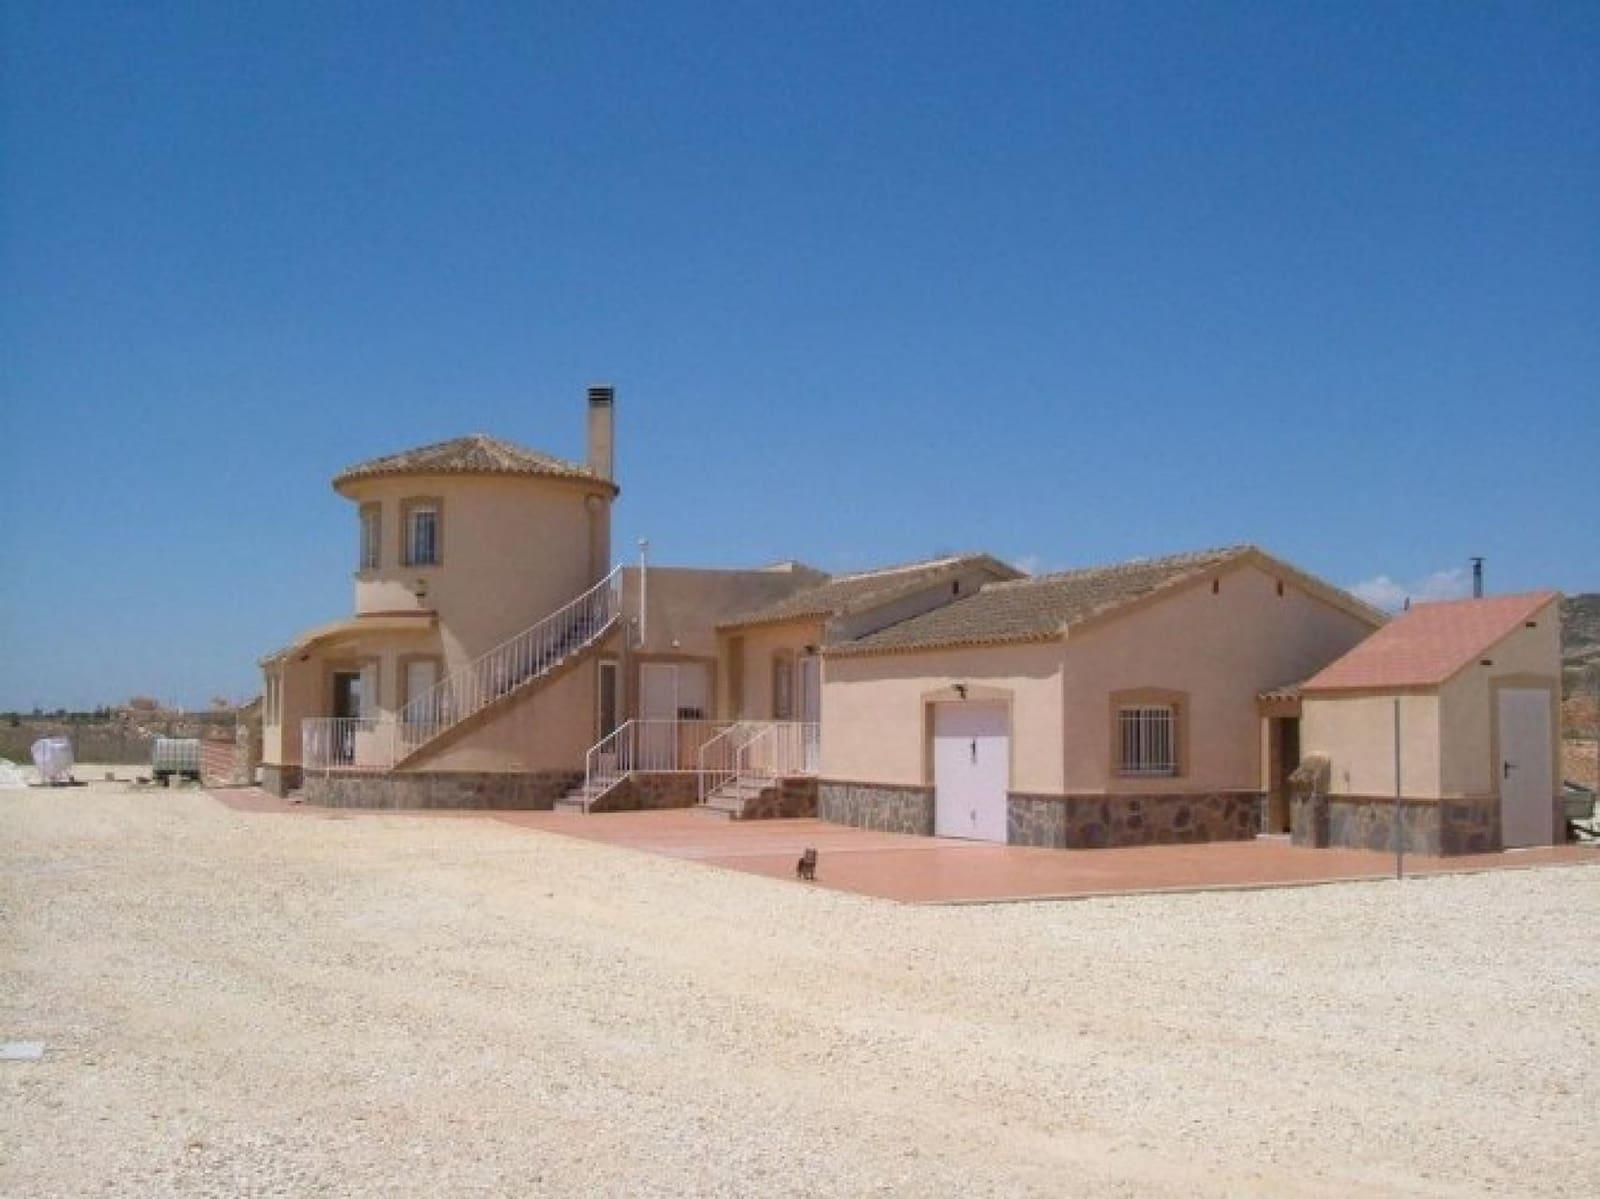 4 bedroom Villa for sale in Pinoso with garage - € 199,995 (Ref: 4396641)